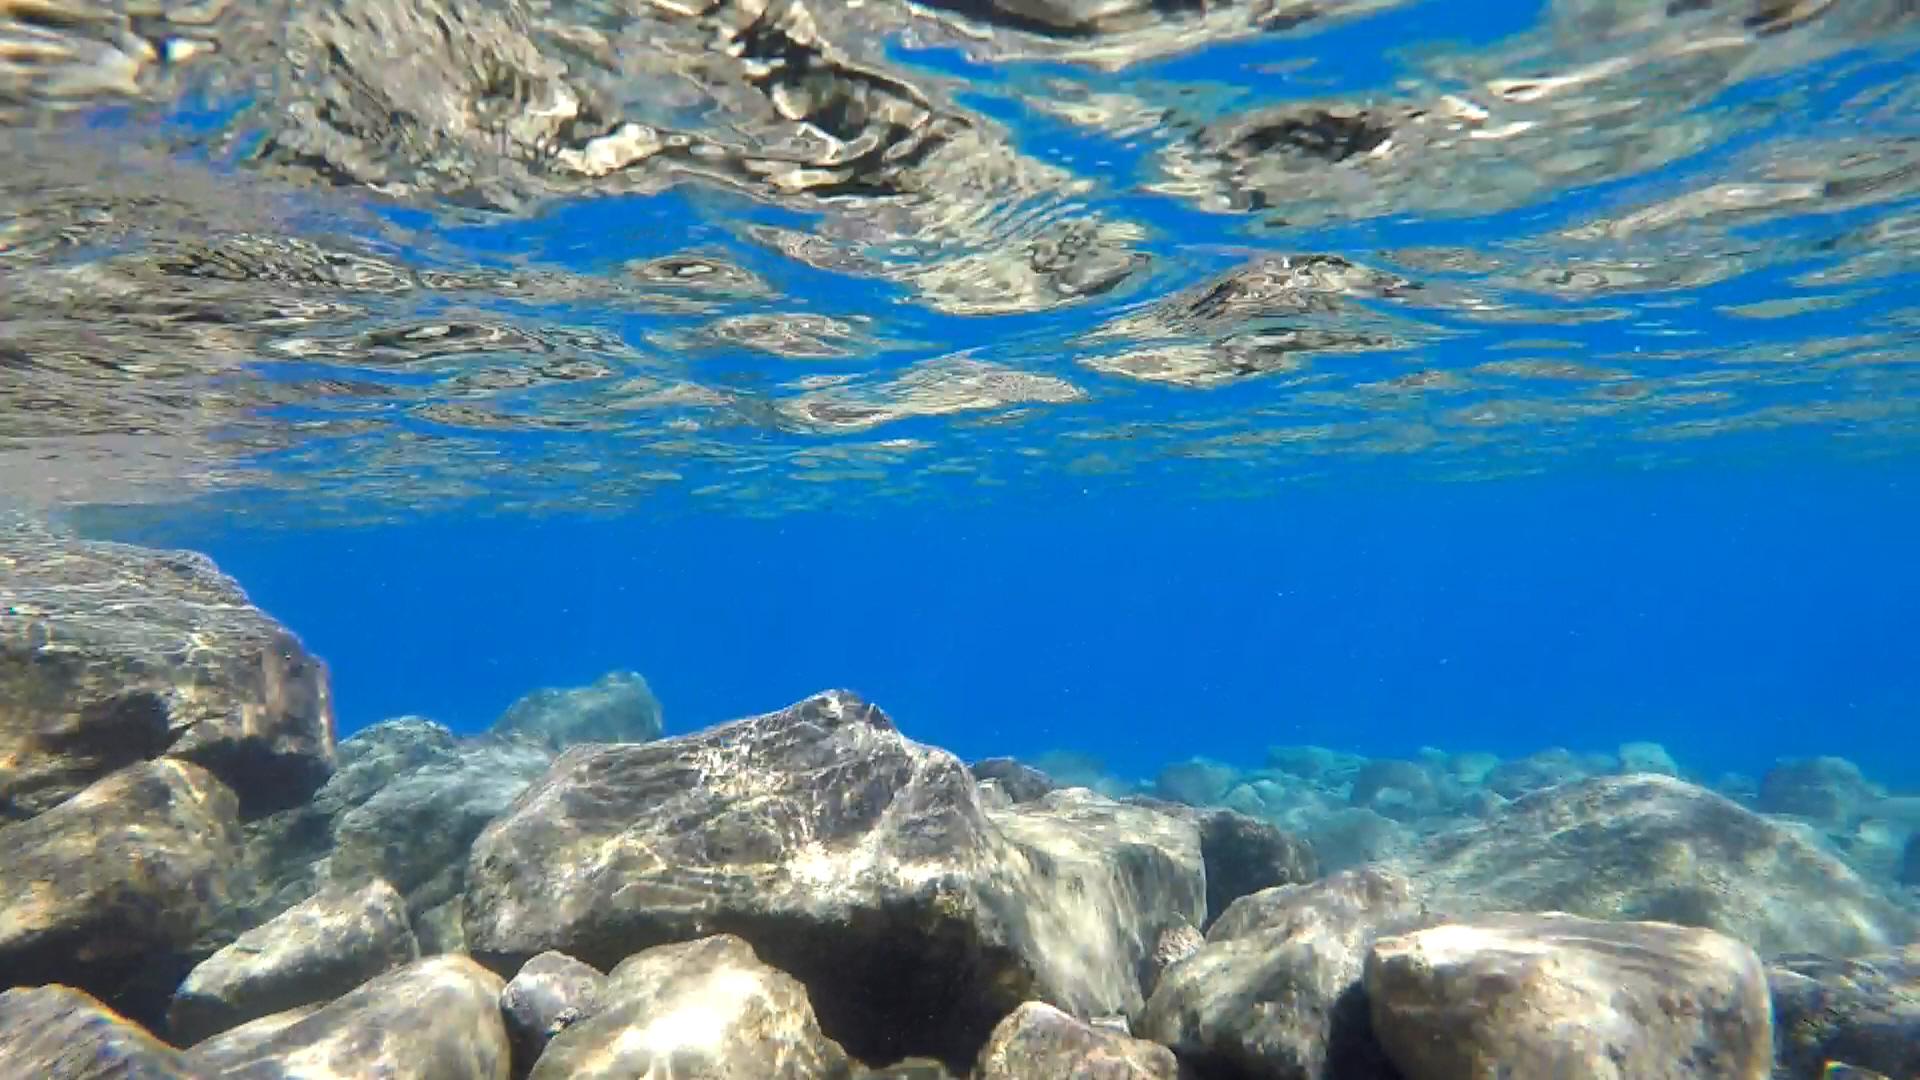 Crater Lake - Underwater